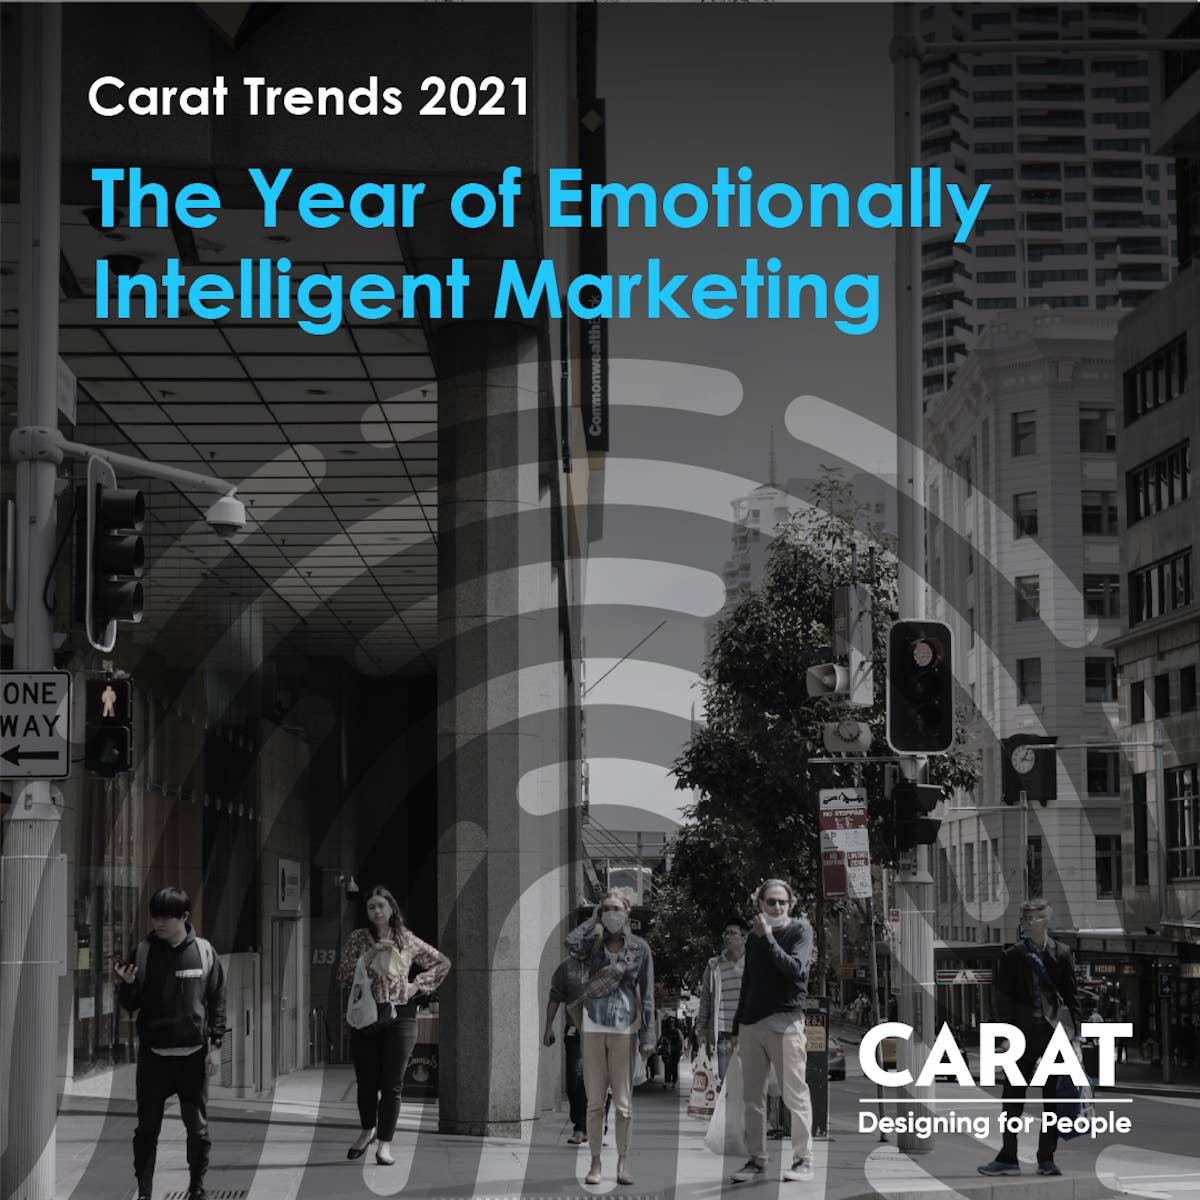 Carat Trends 2021